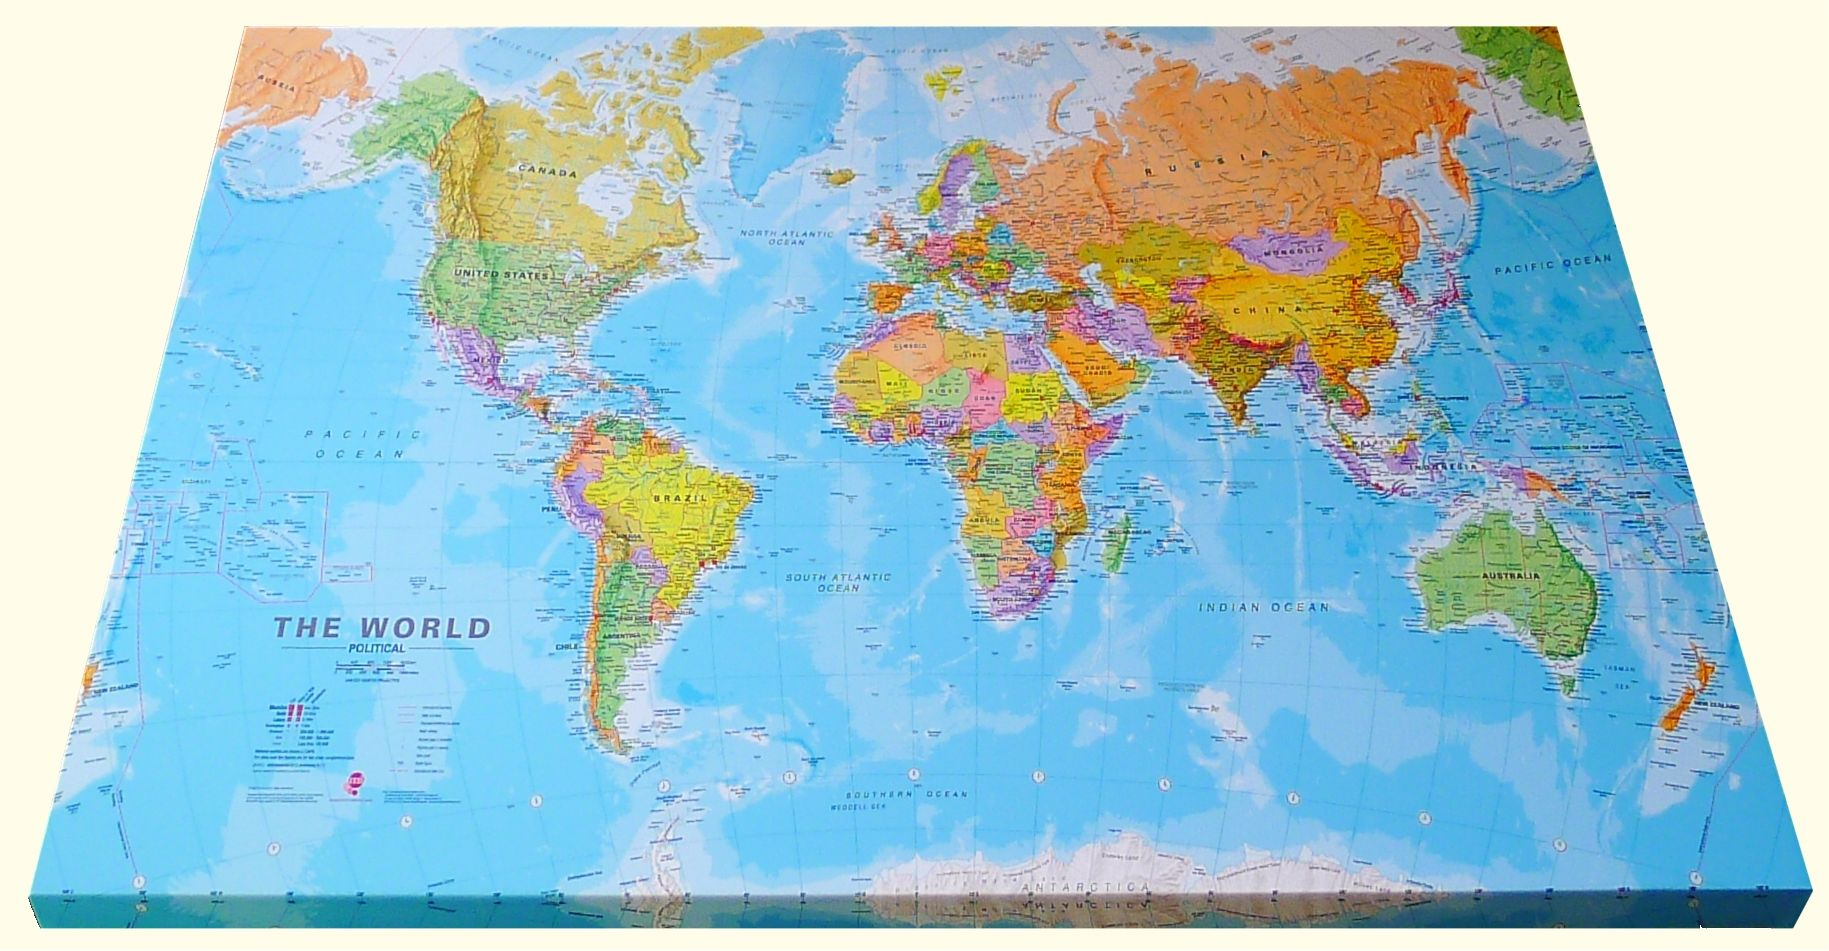 Ongekend Stanley & Livingstone reisgidsen en landkaarten reisboekhandel WS-52